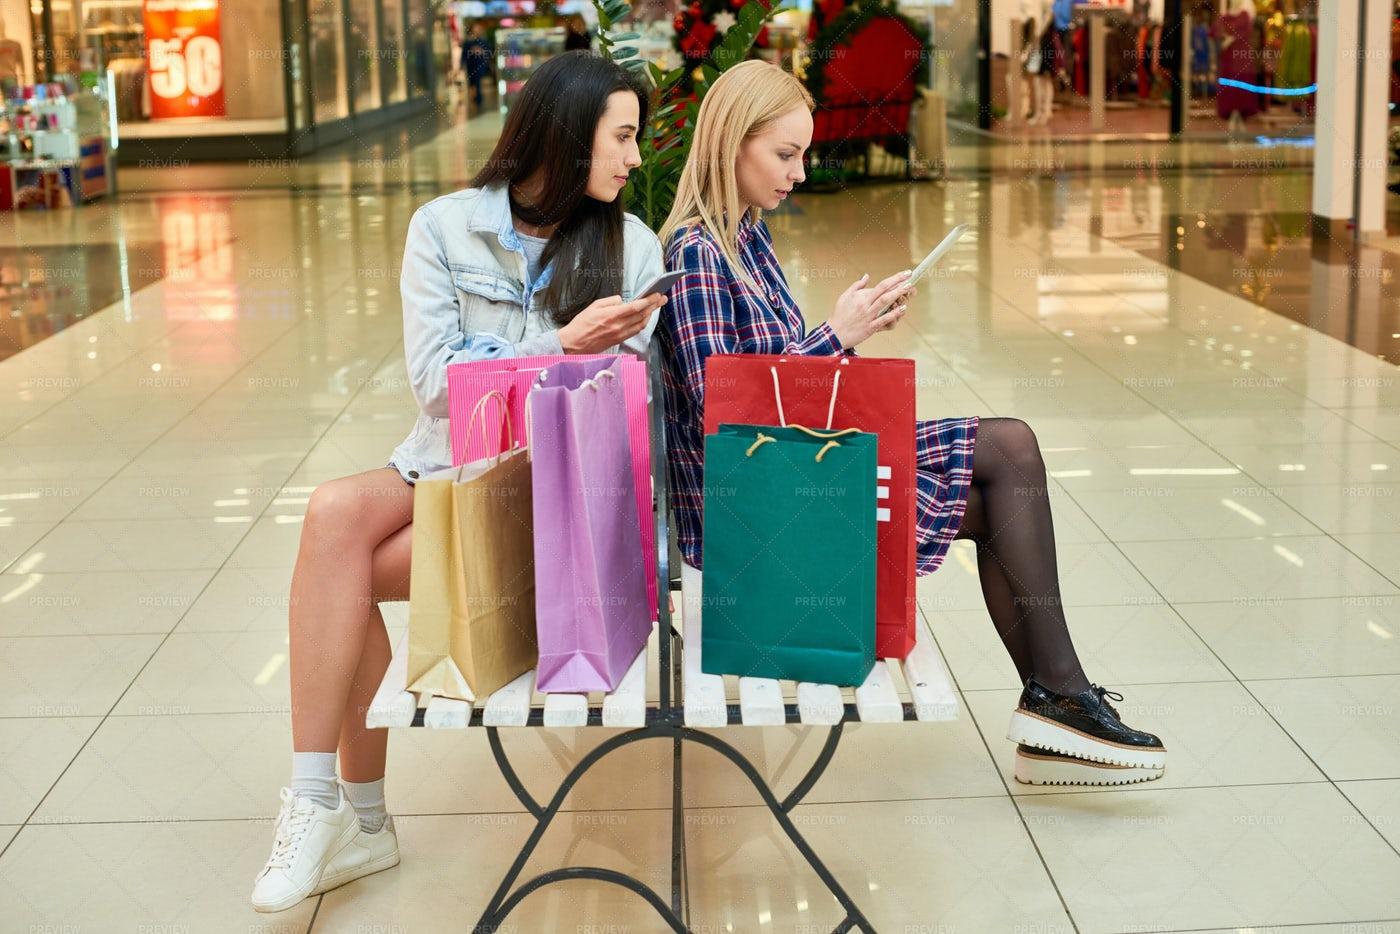 Young Shopaholics Addicted To...: Stock Photos